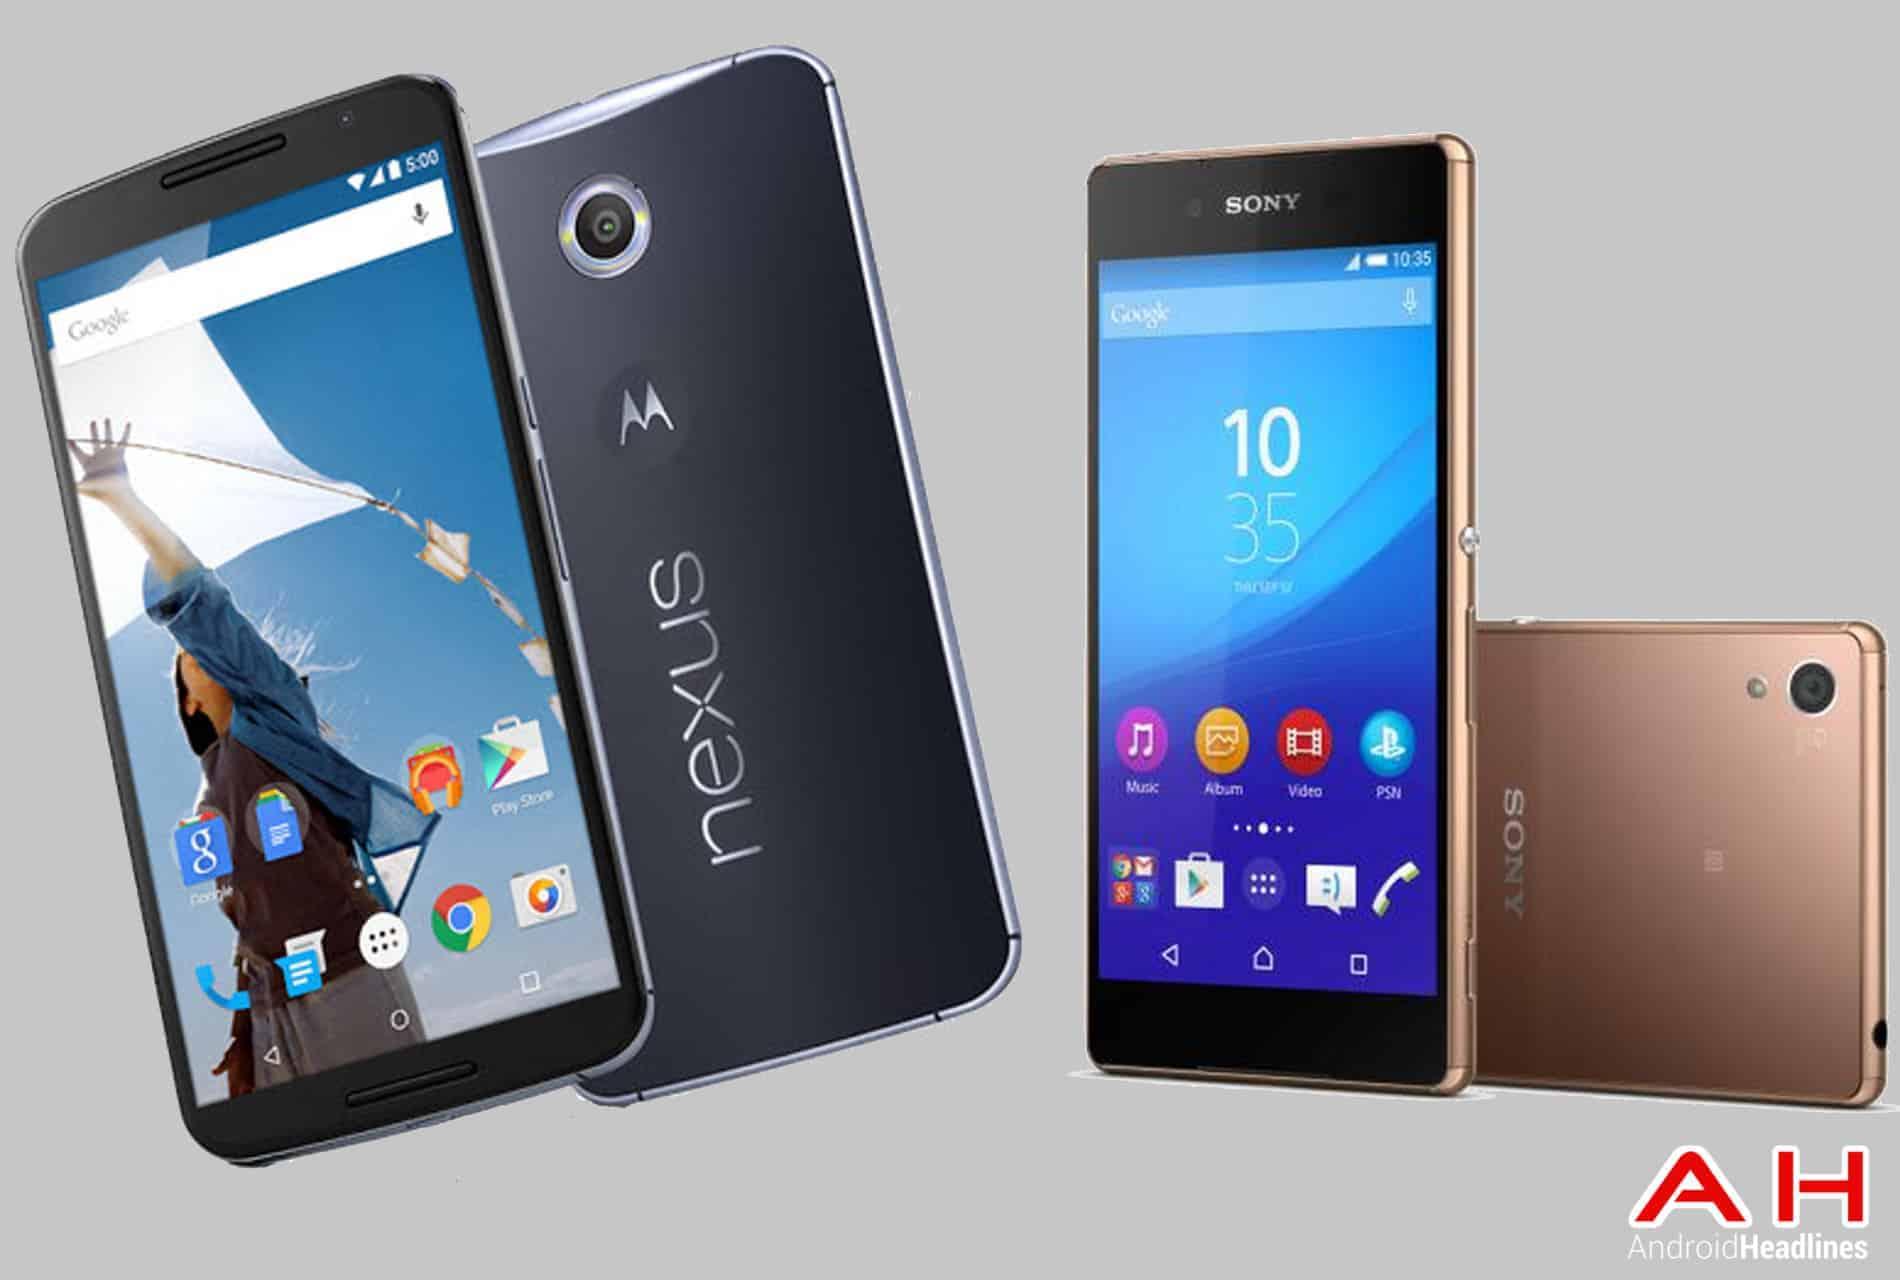 Xperia Z4 vs Nexus 6 cam AH